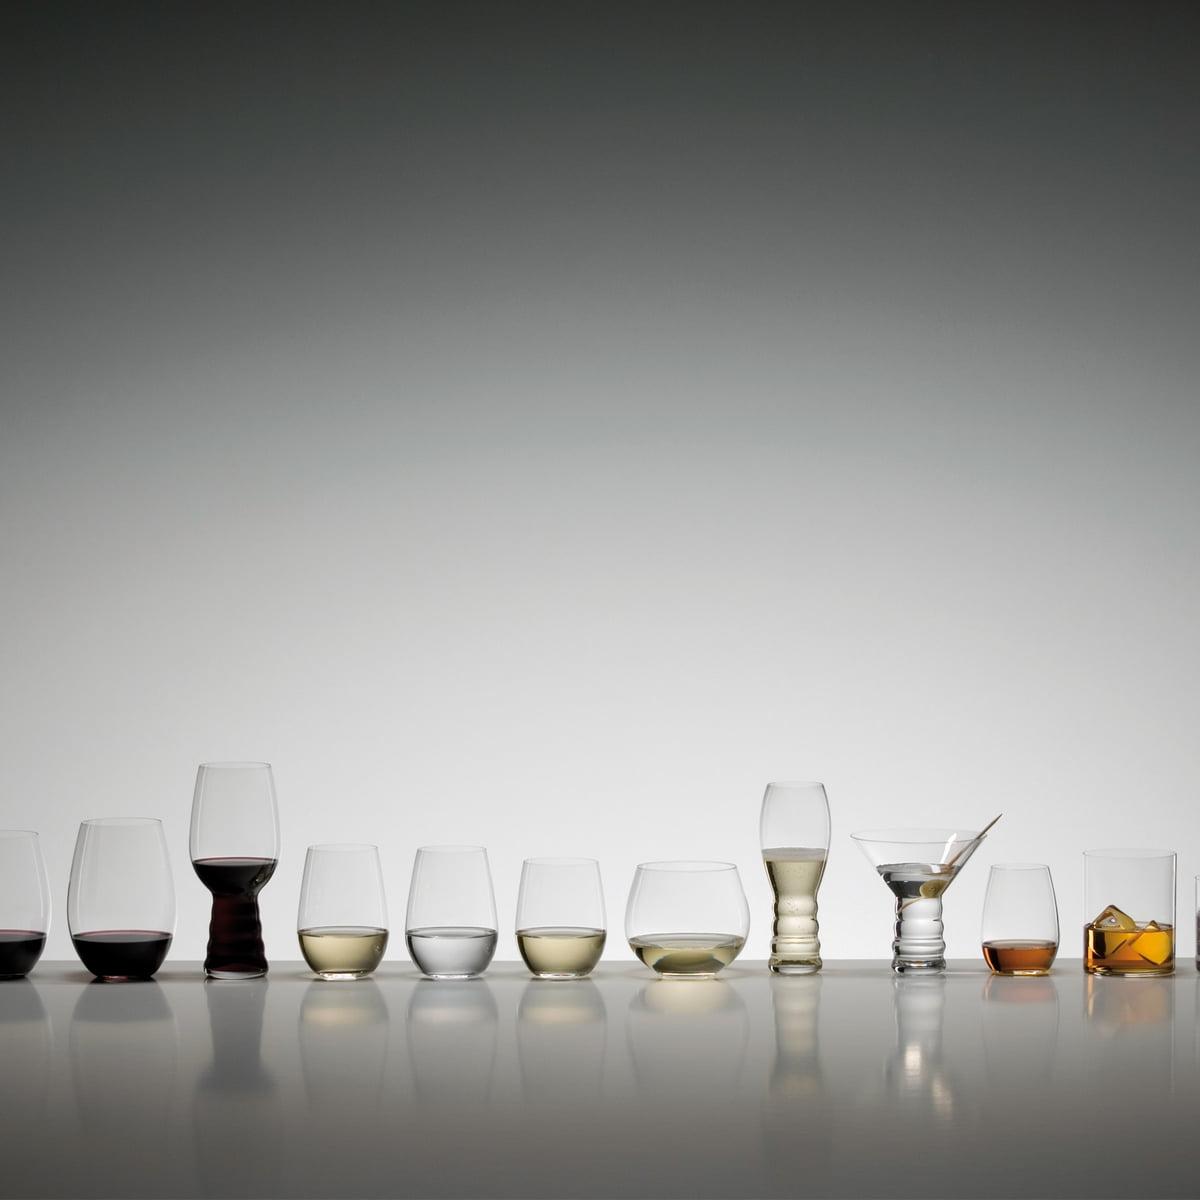 ba1cd63e374 O wine Riesling / Sauvignon Blanc glass (set of 2) by Riedel